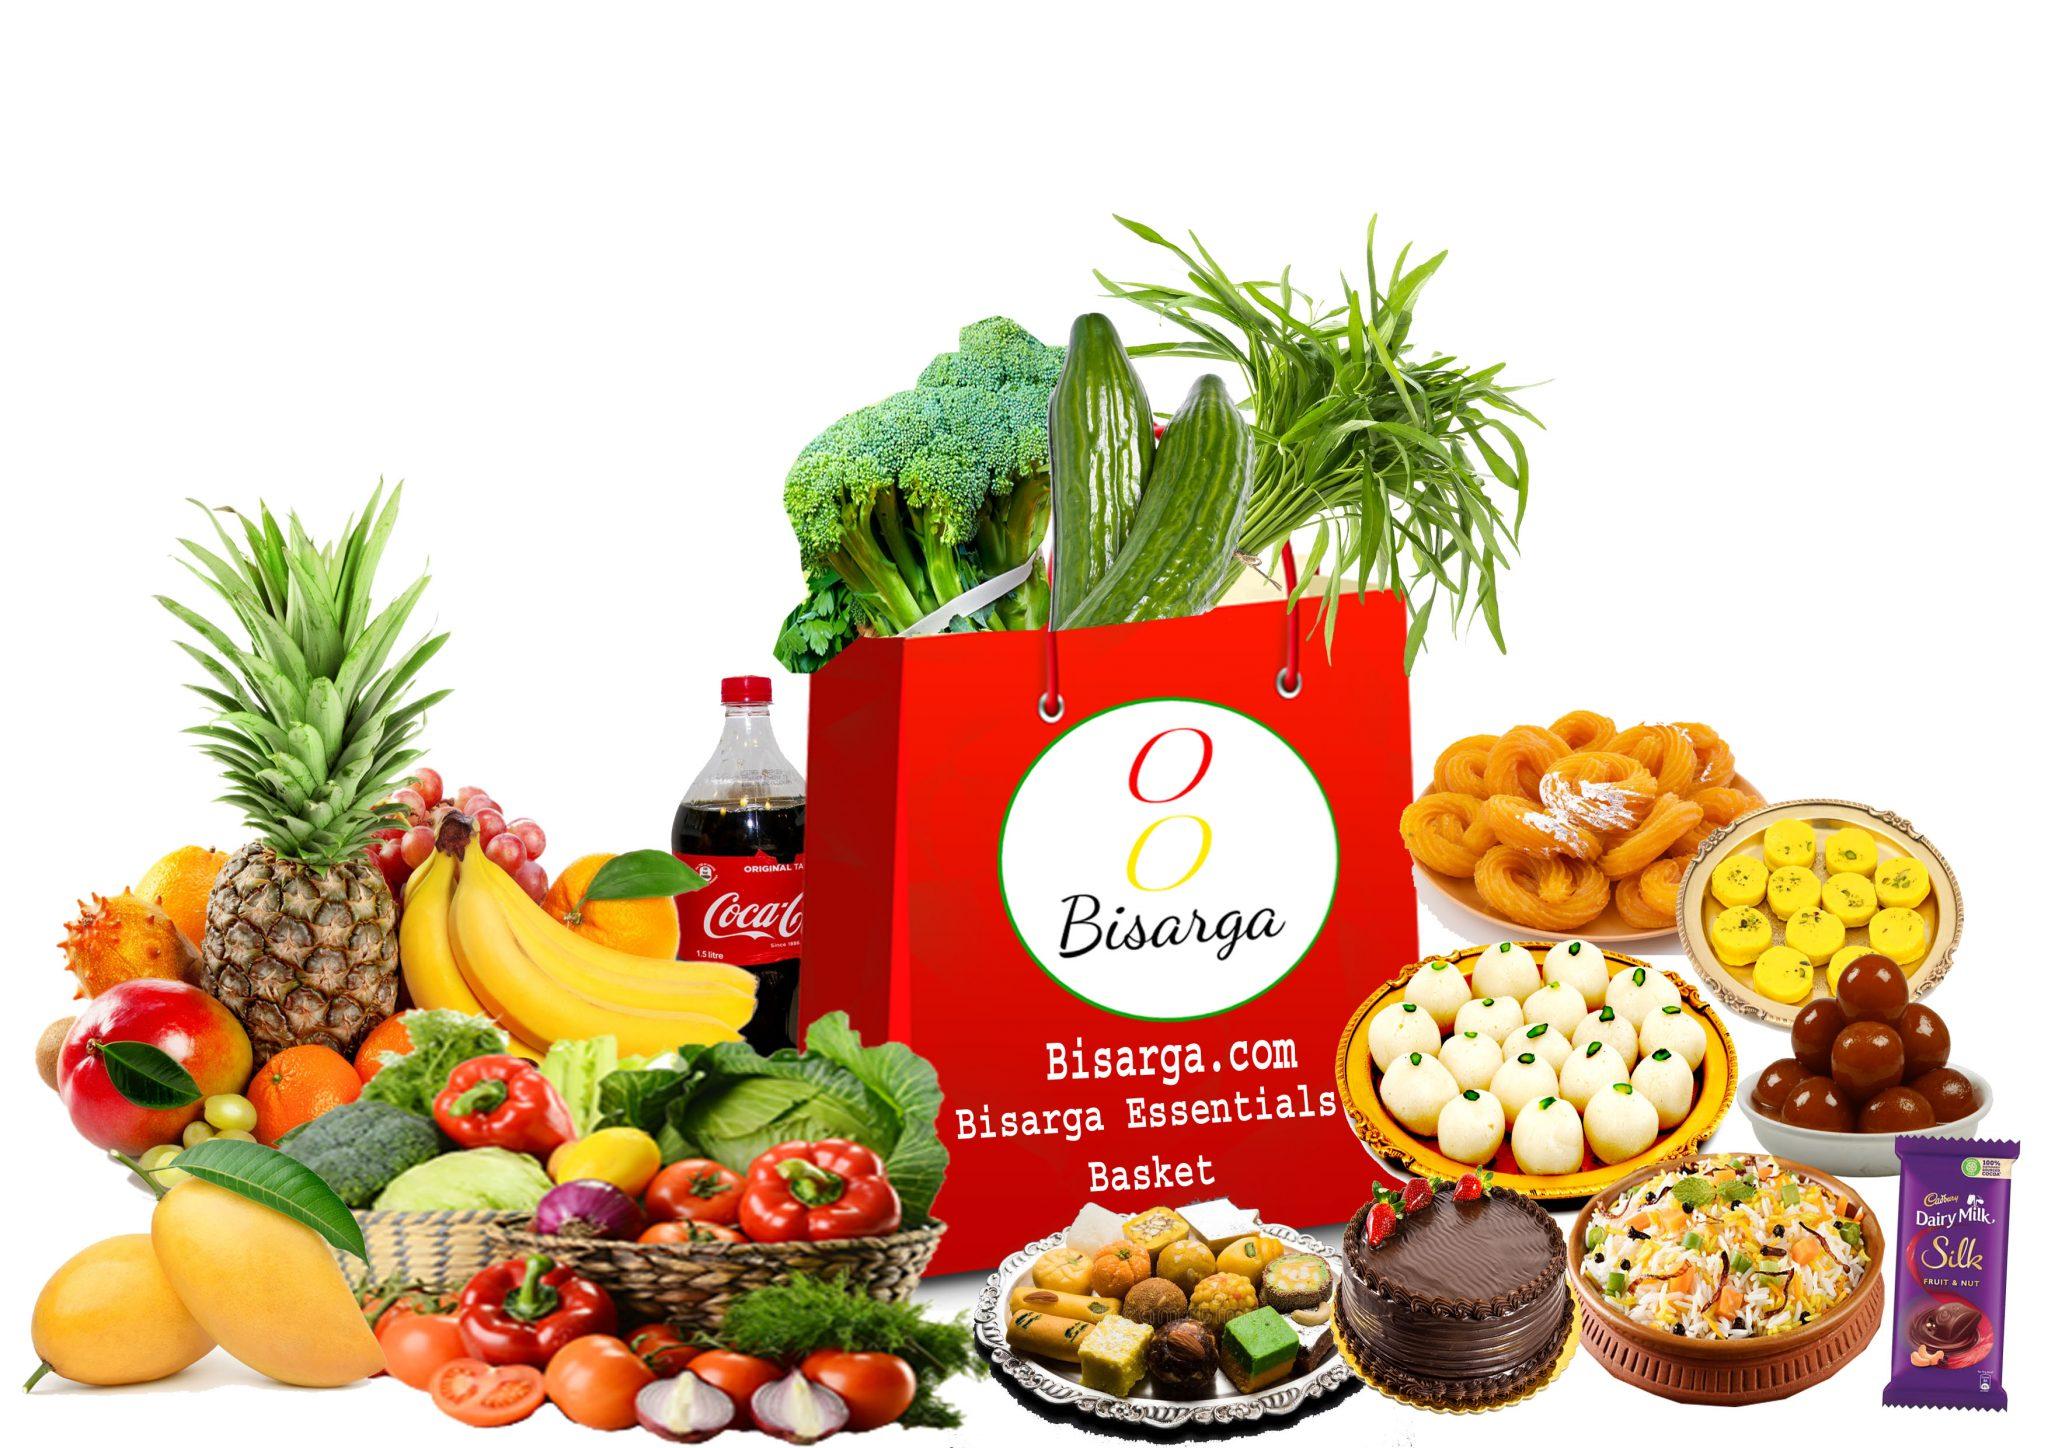 Bisarga Essential products